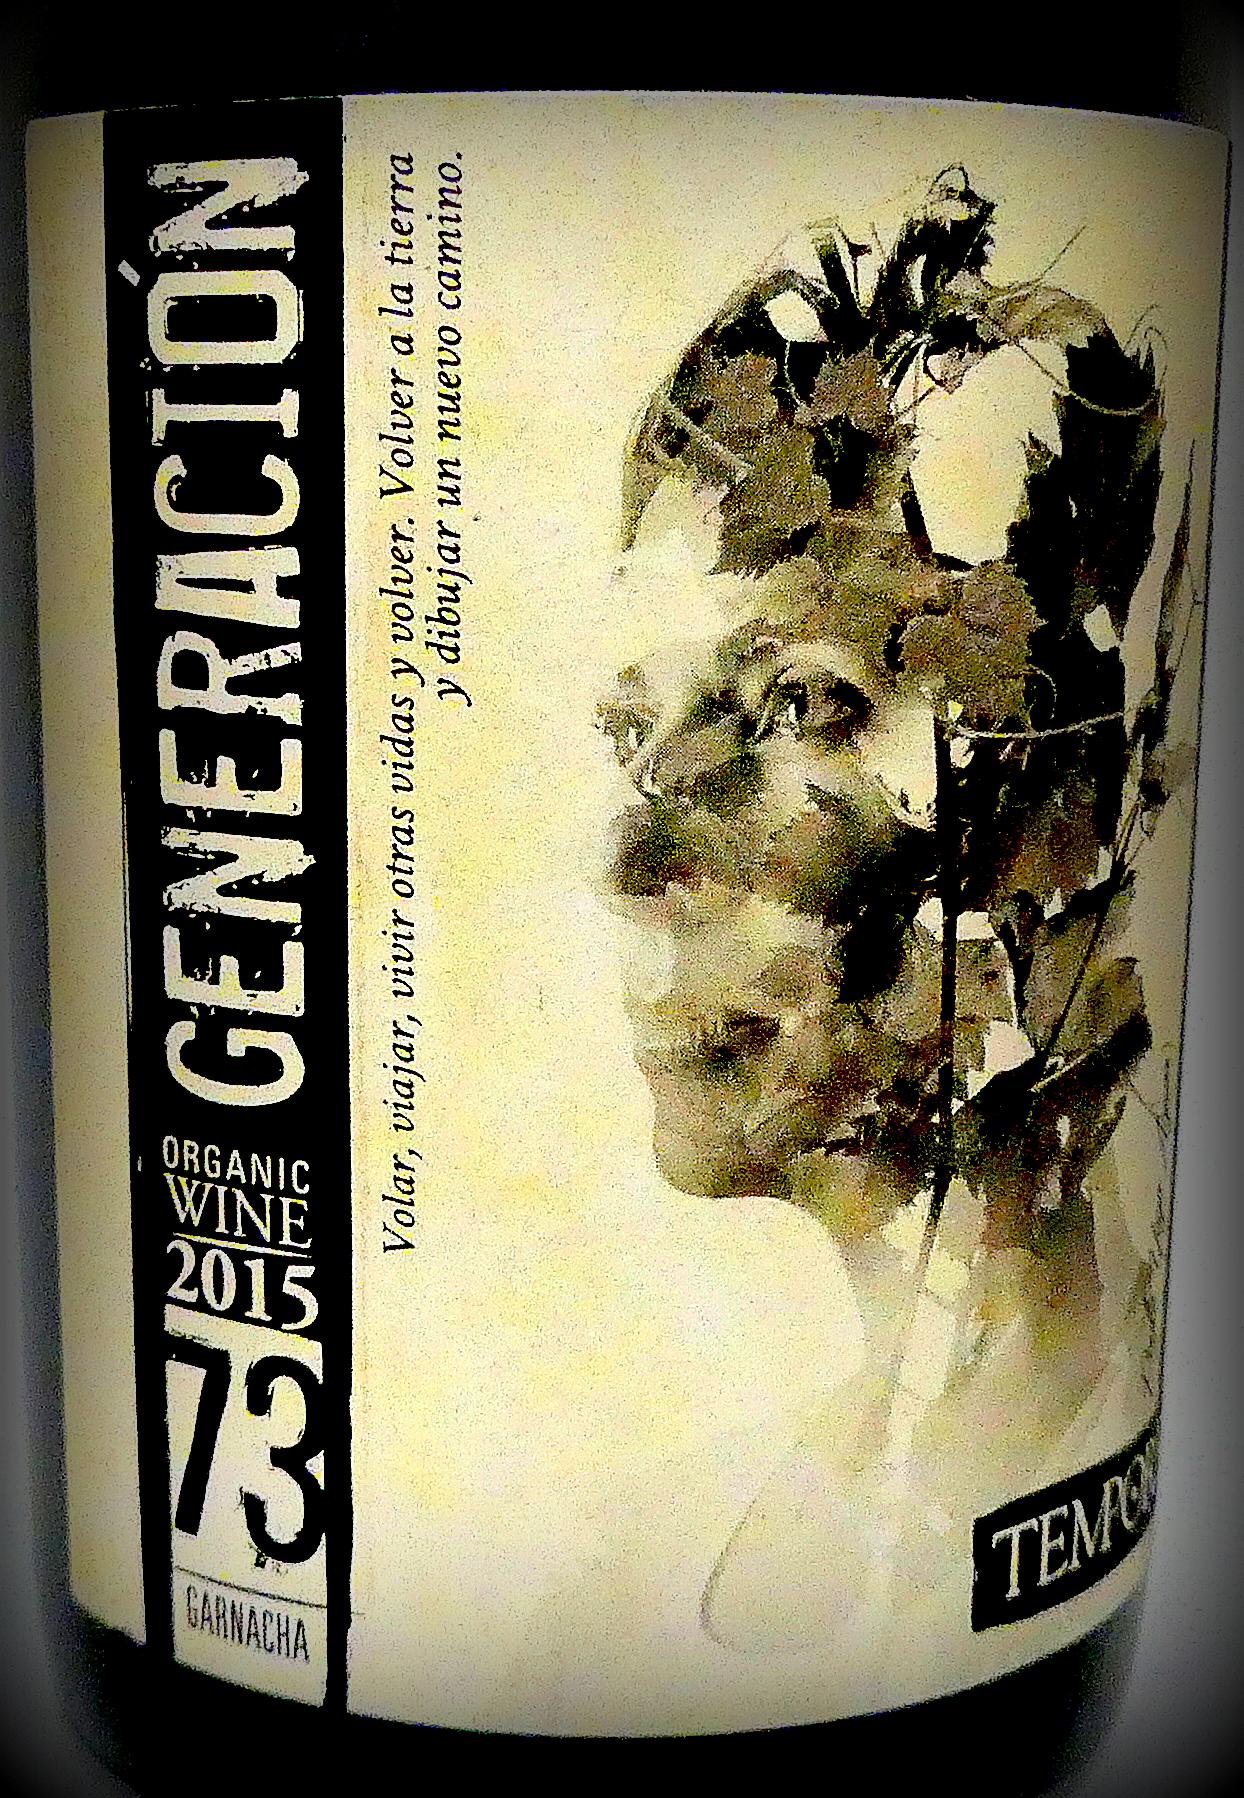 Generation 73 Garnacha